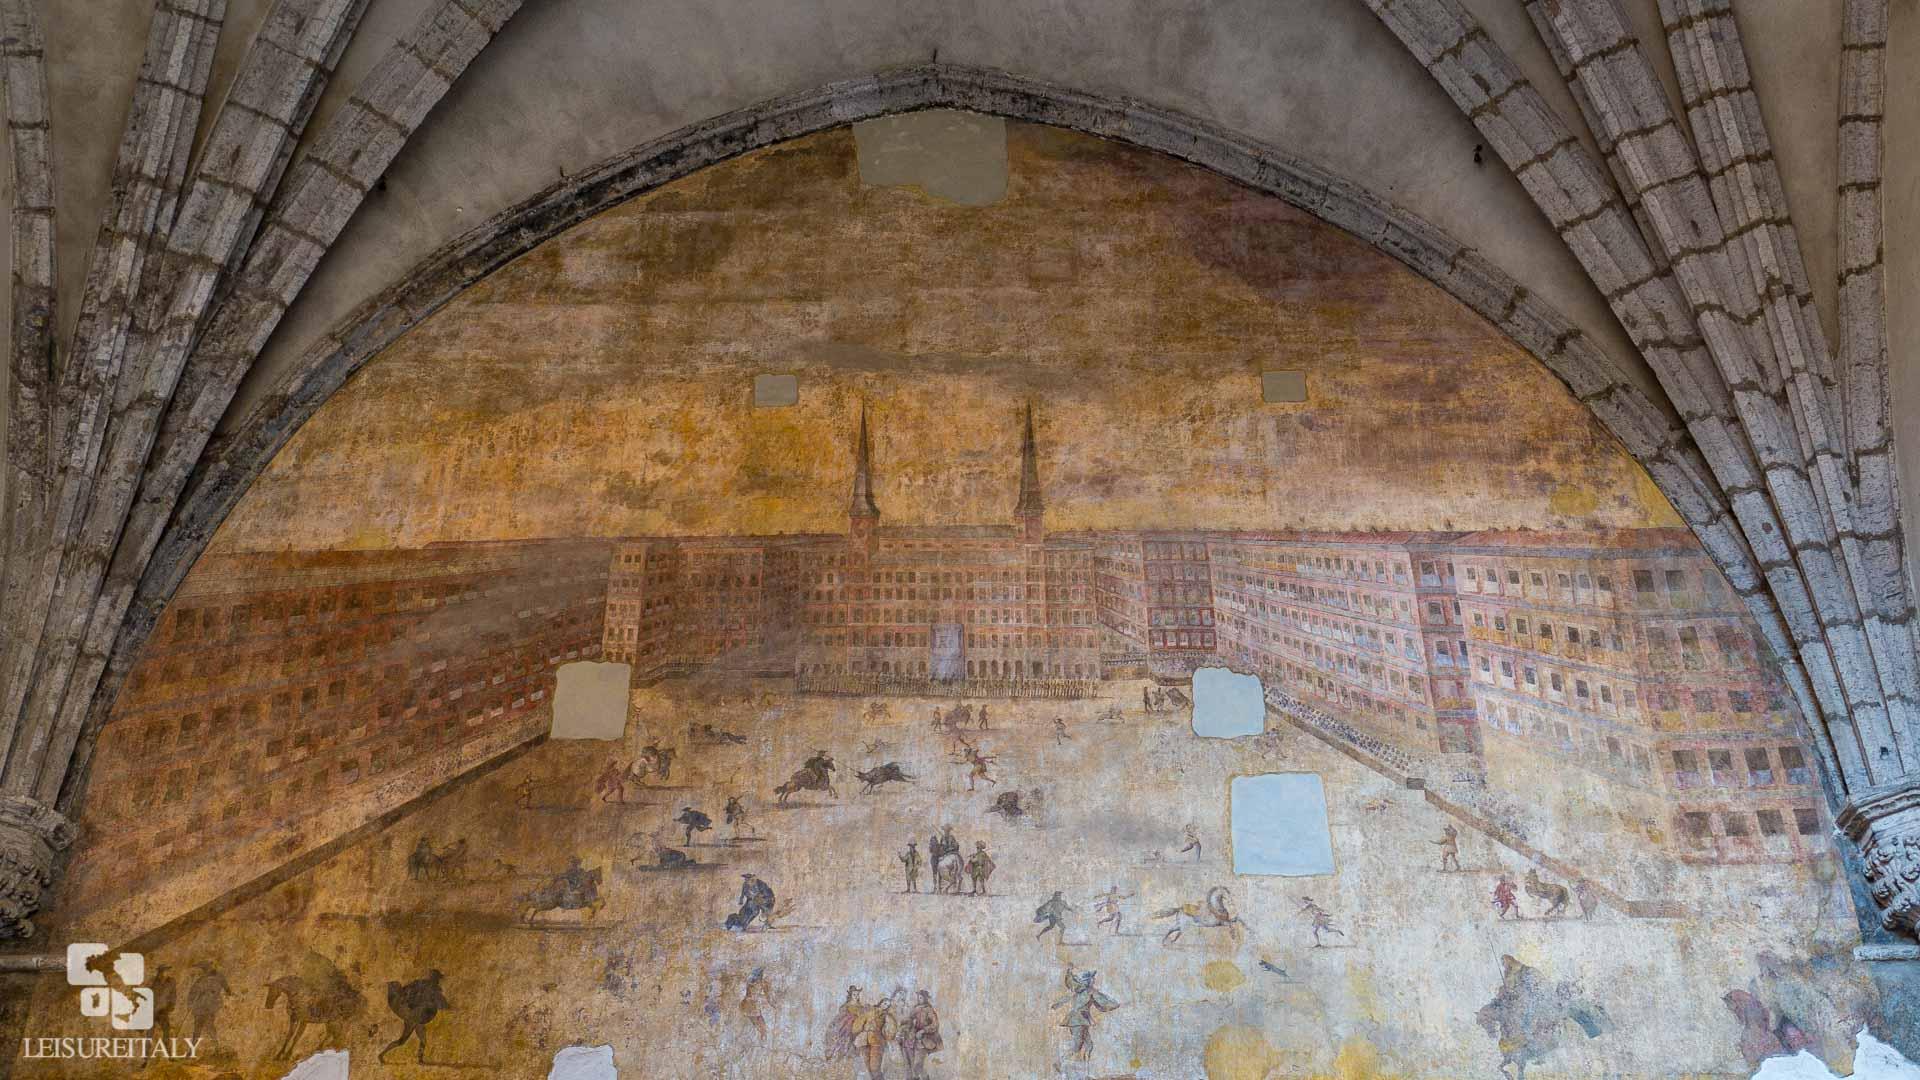 Castel Nuovo - A fresco